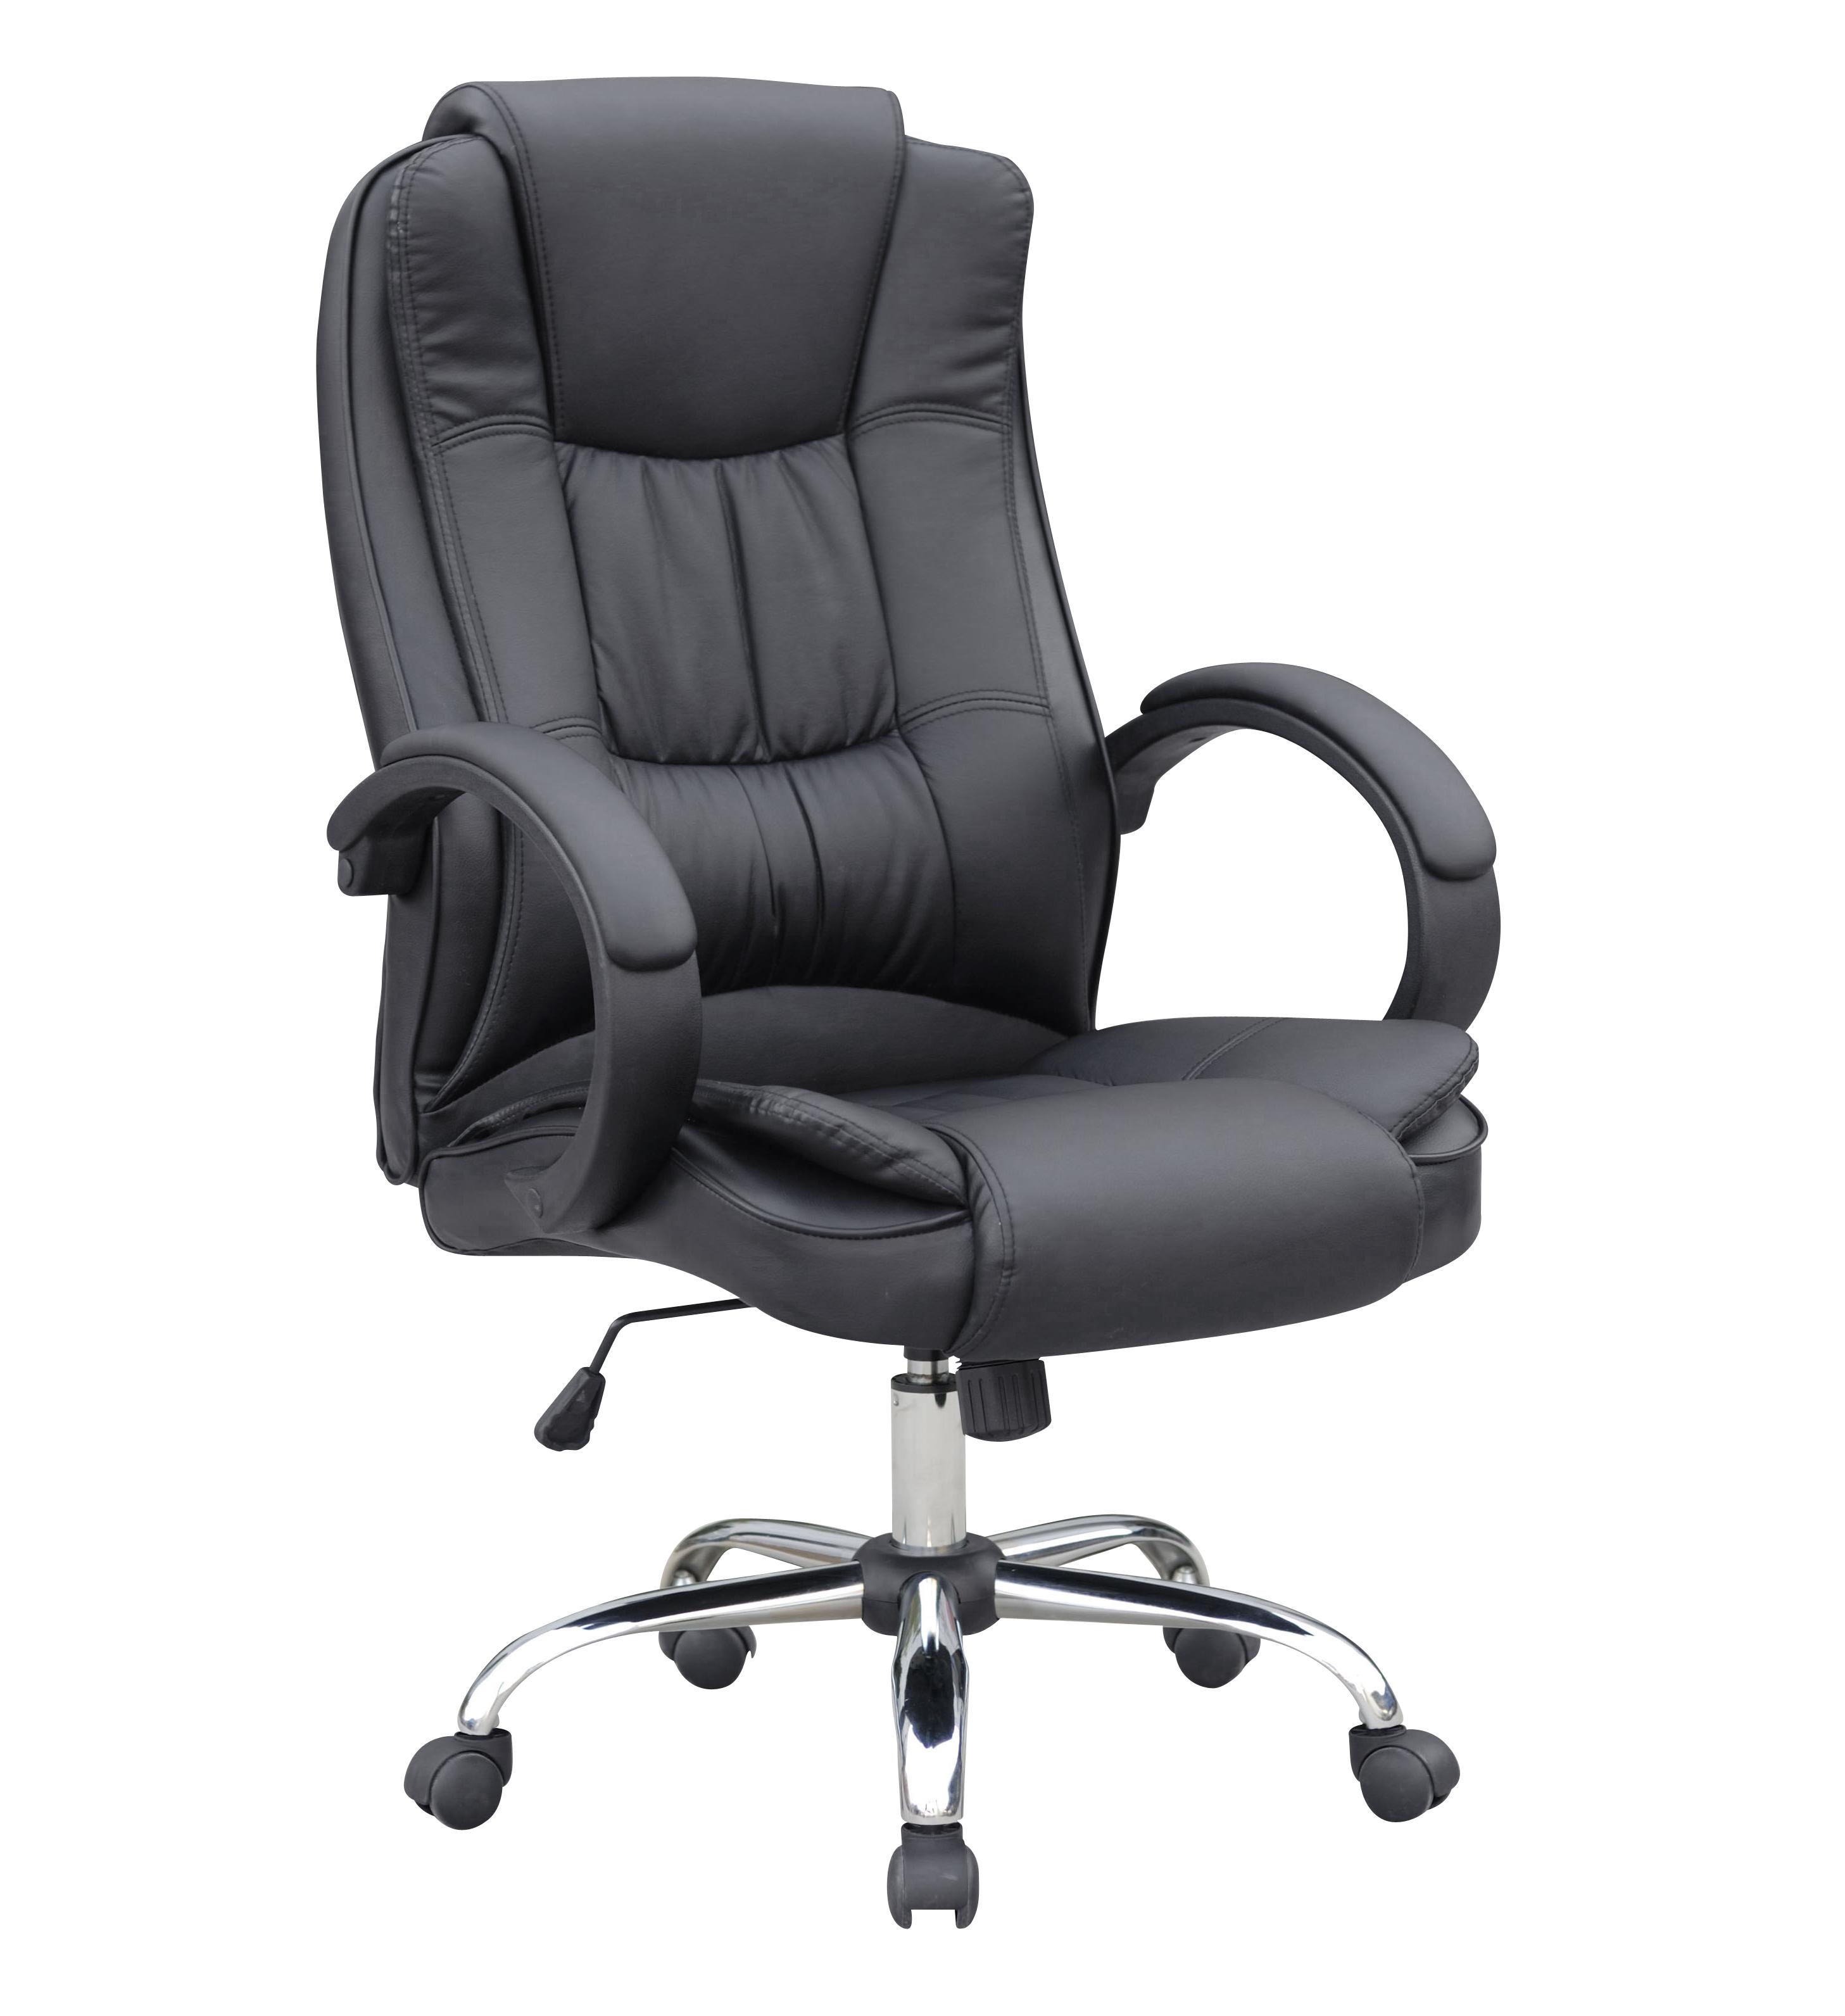 Office Chair Executive High Back Pu